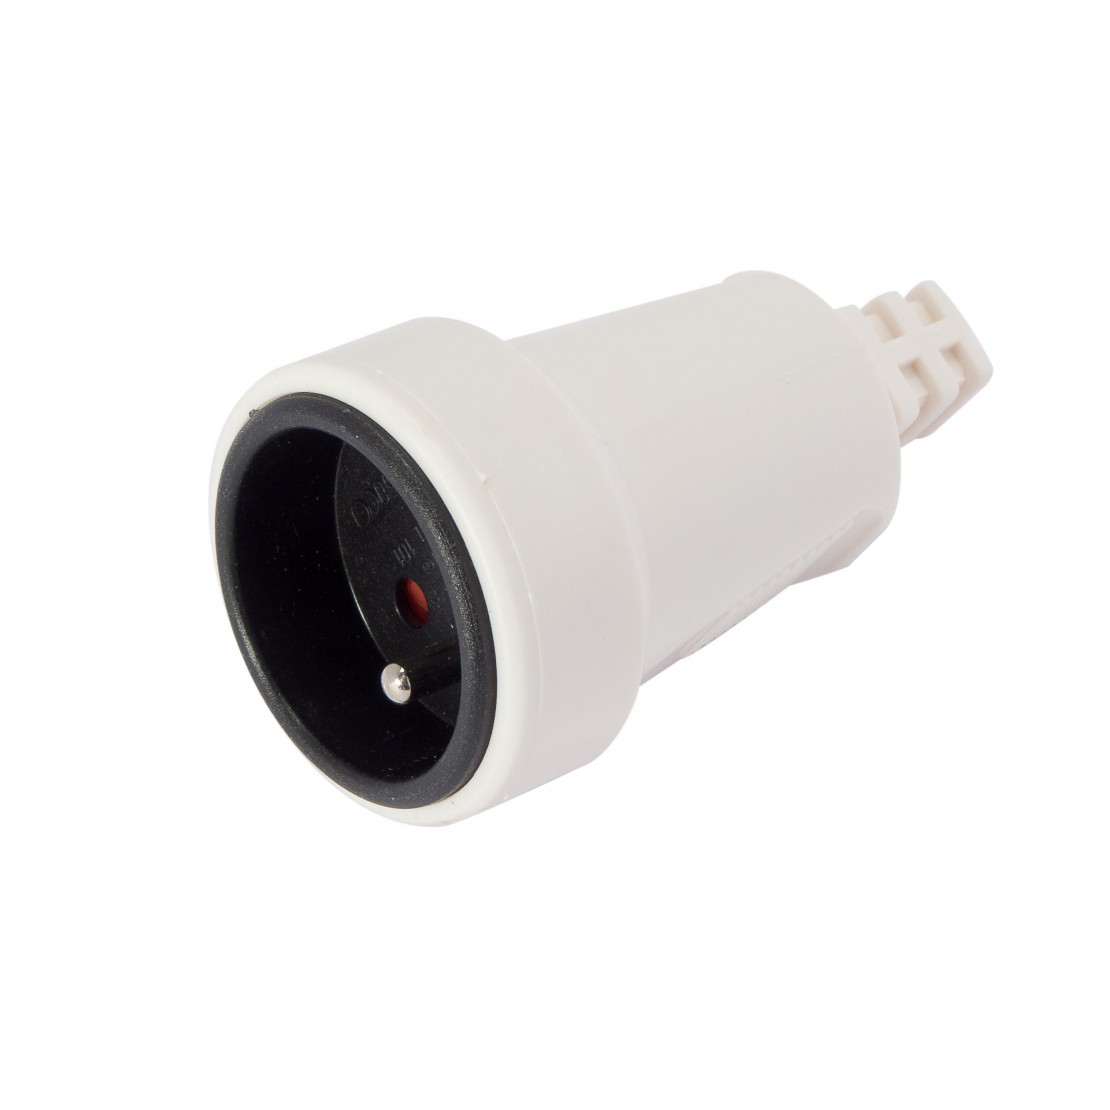 Enchufe móvil redondo blanco 16 A